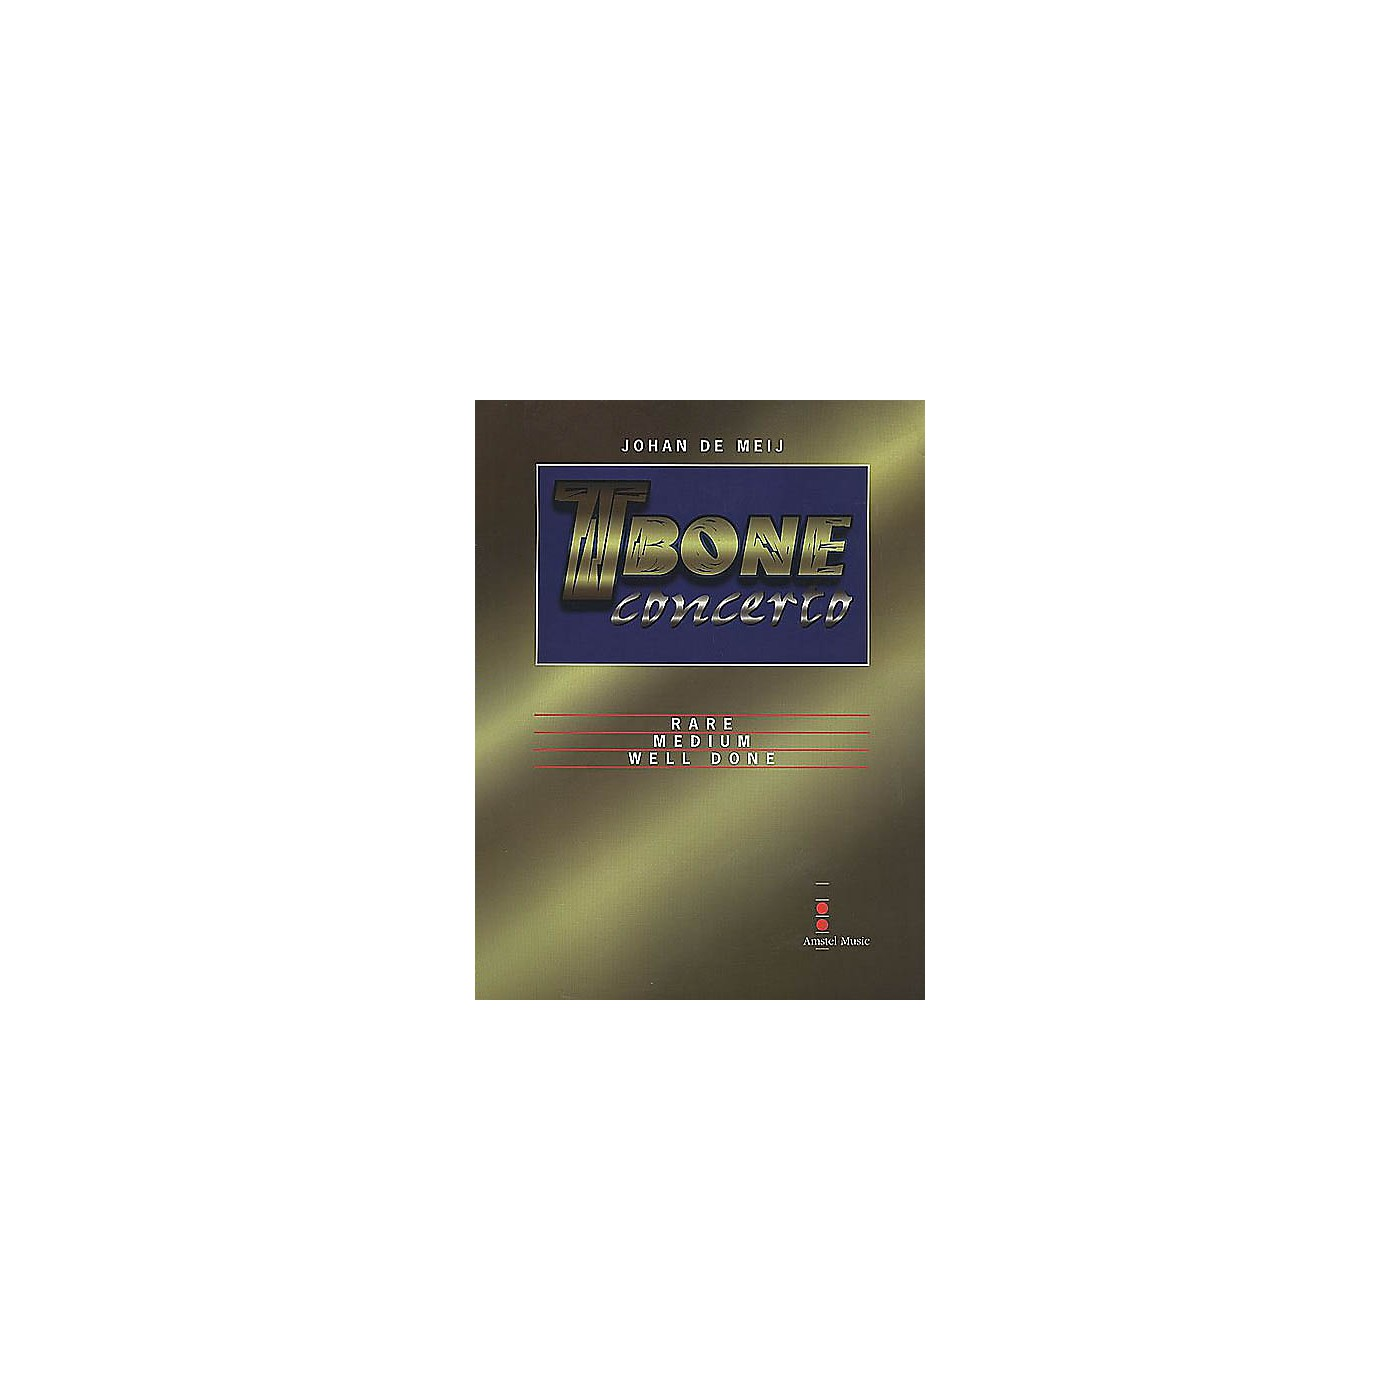 Amstel Music T-Bone Concerto (Solo Part Only) Concert Band Level 5-6 Composed by Johan de Meij thumbnail